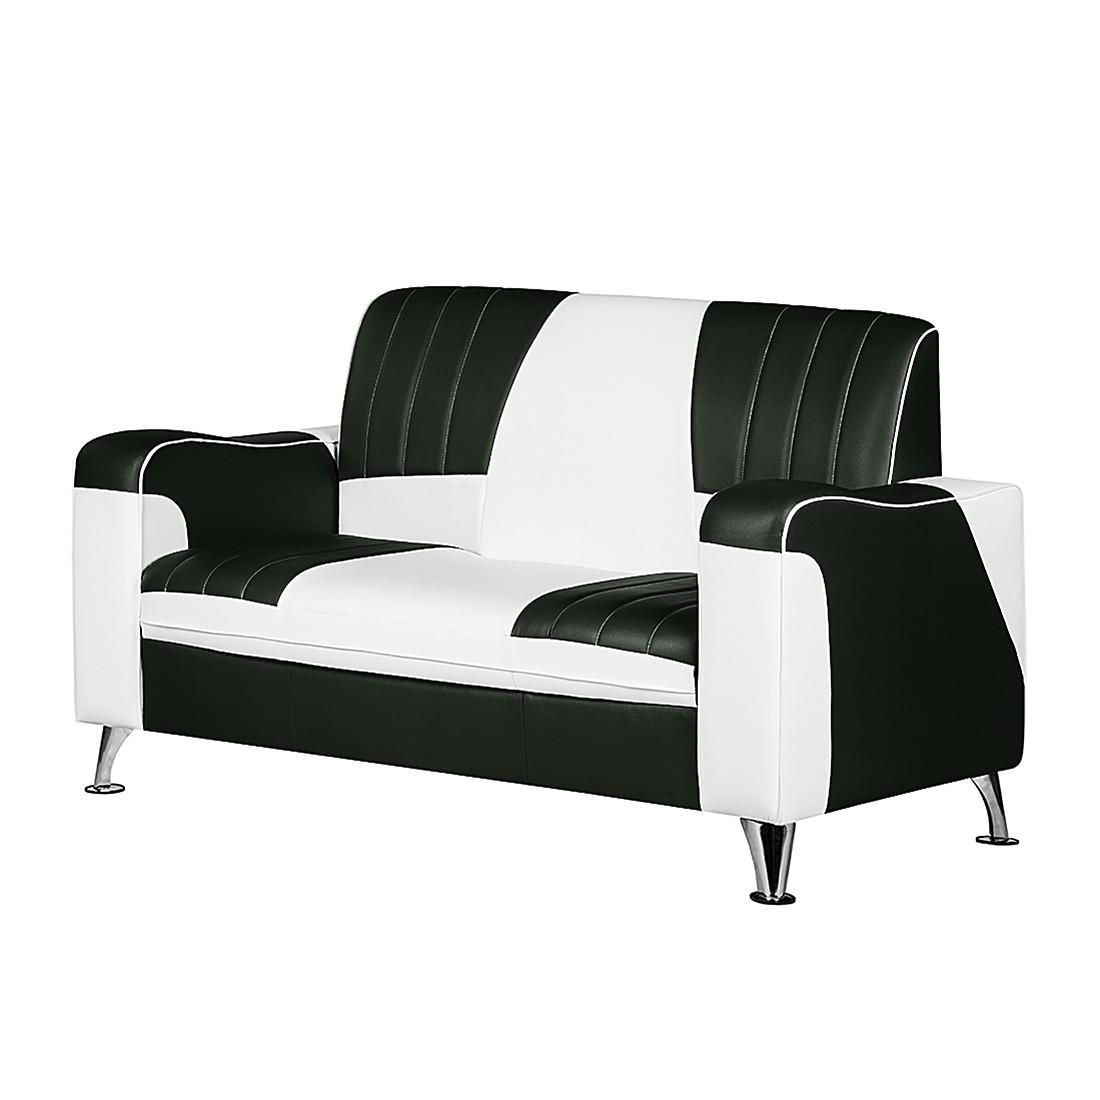 goedkoop Bank Nixa 2zitsbank wit kunstleer zwart Studio Monroe